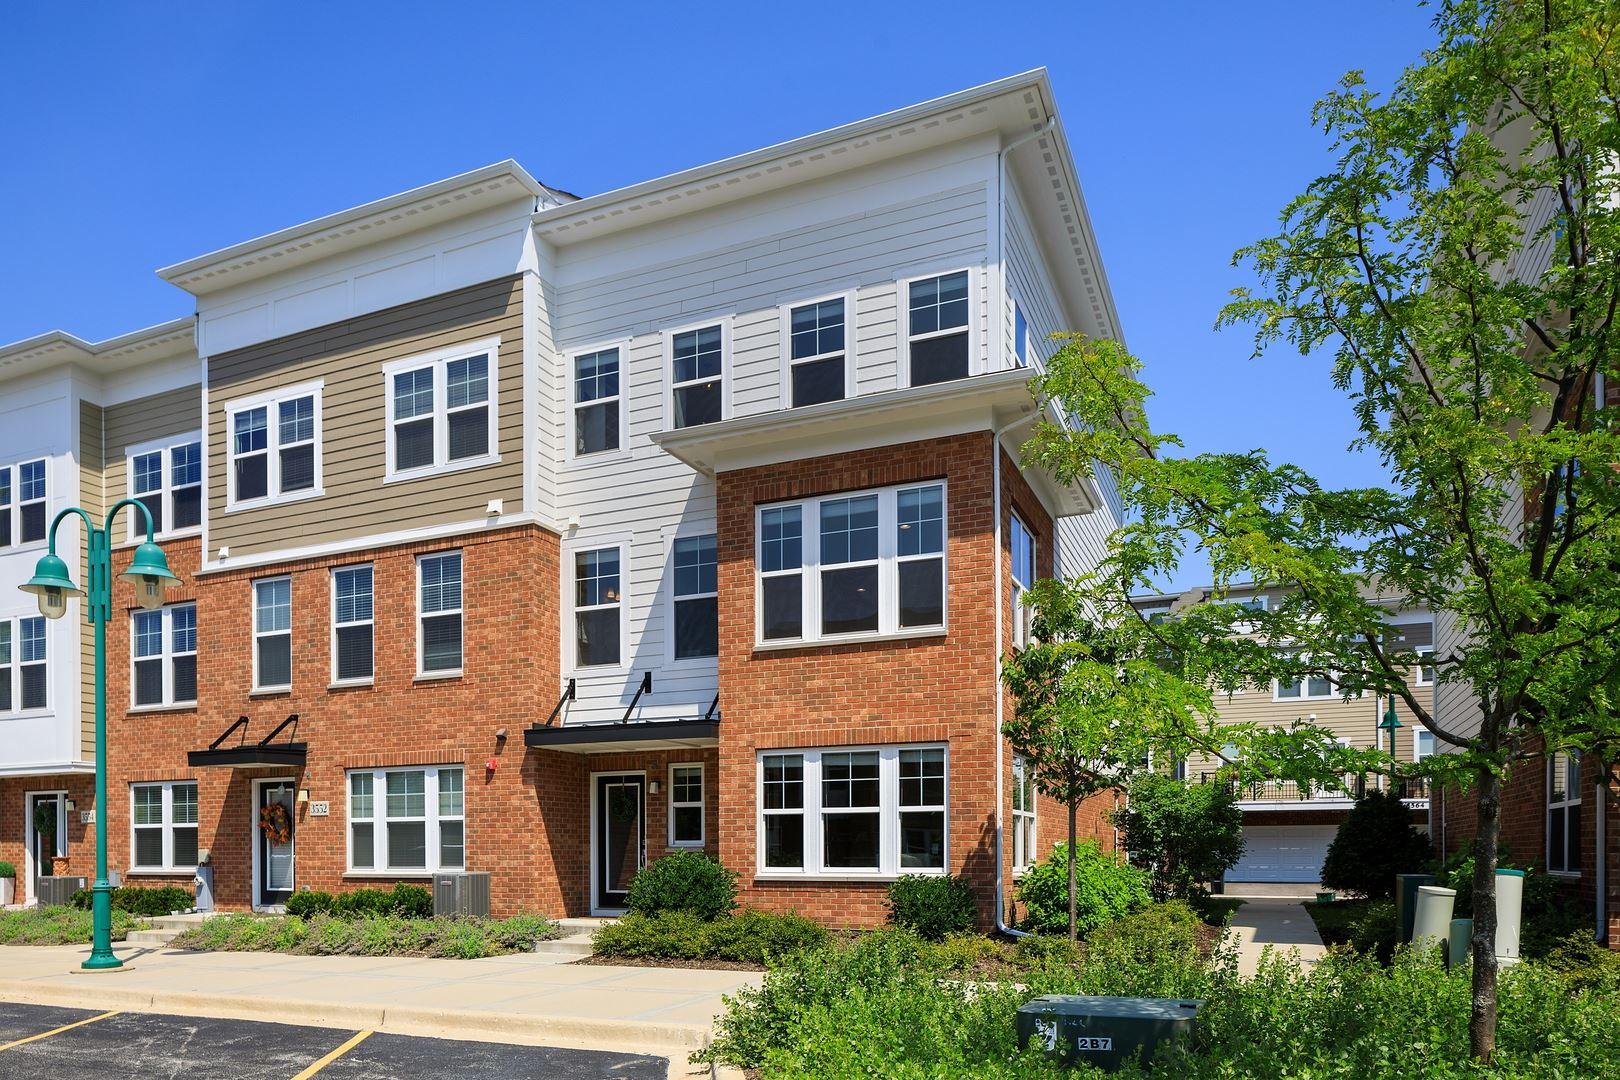 3550 Irving Place, Woodridge, IL 60517 - #: 10772818